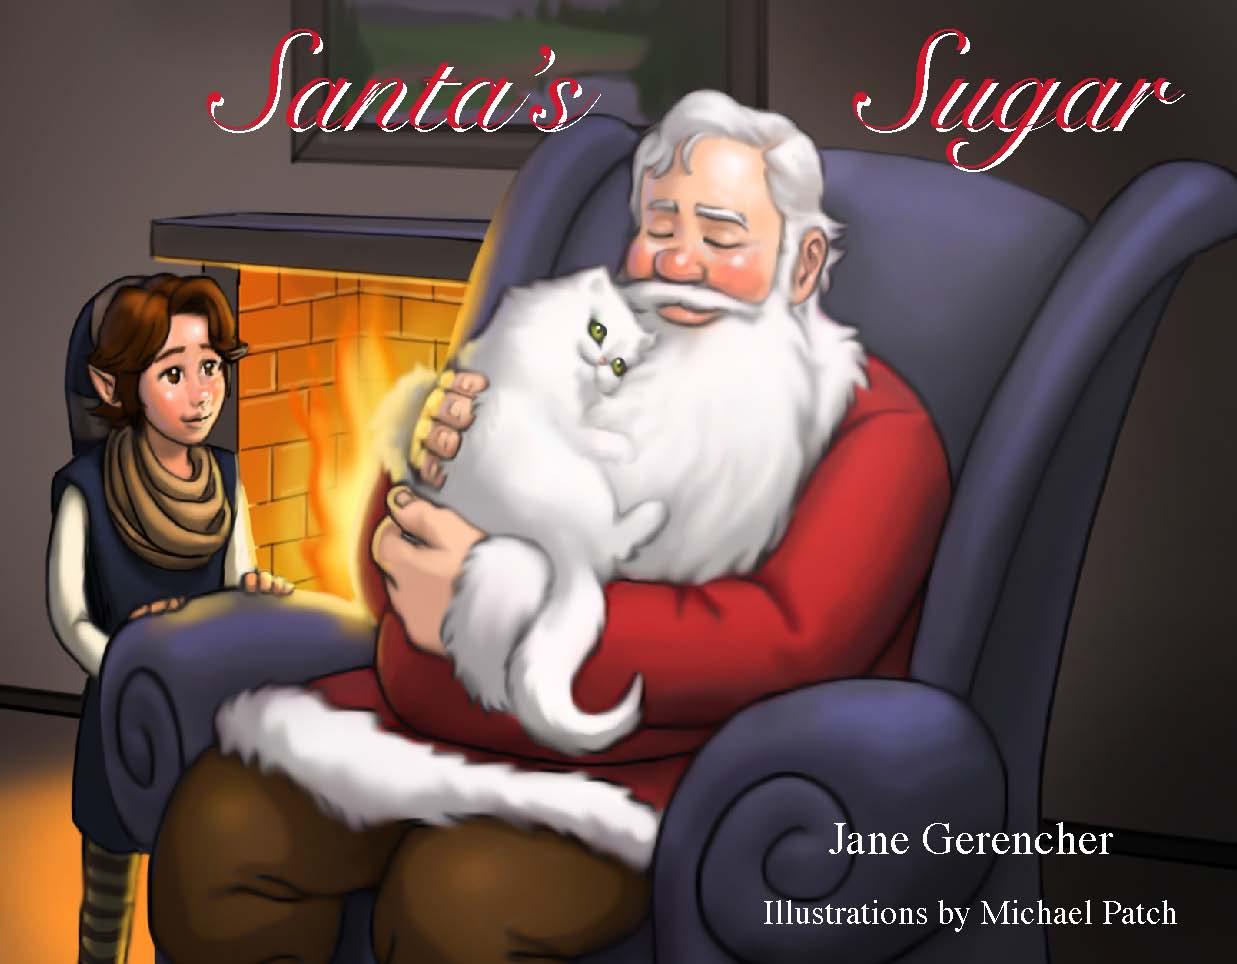 Santa's Sugar book cover